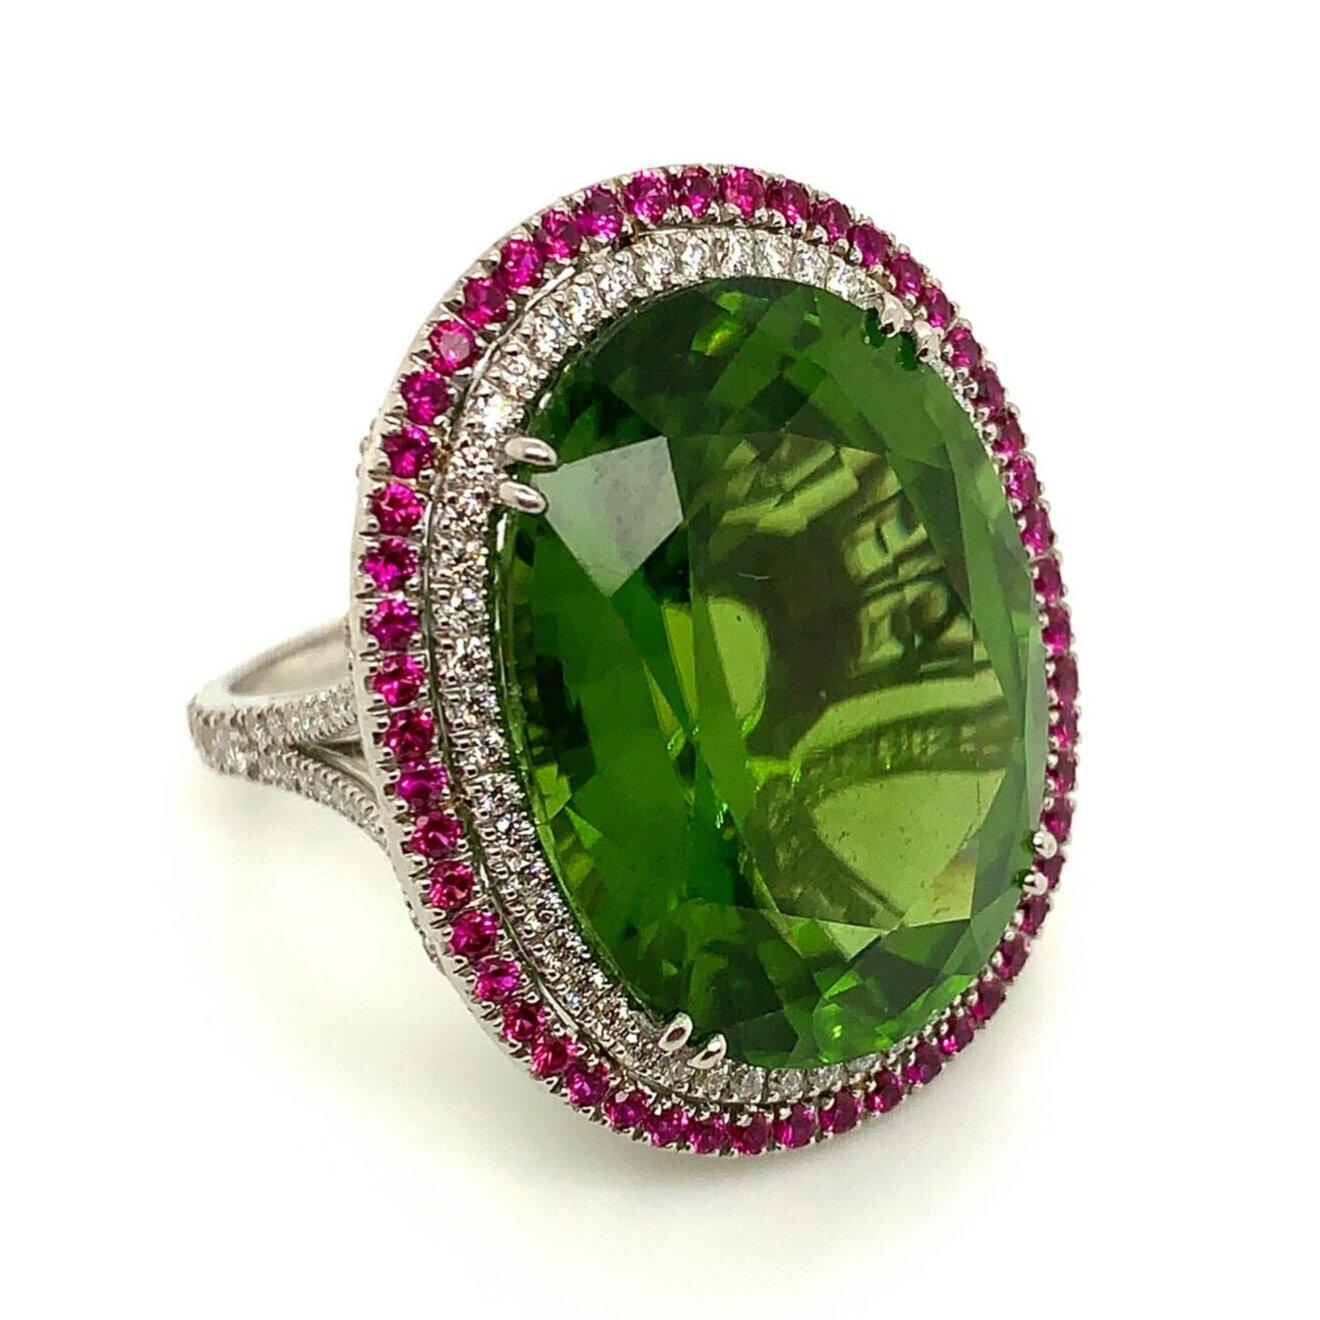 Platinum Peridot Ring with Tiny Rubies and Diamonds   Est. US$ 6,500-7,500